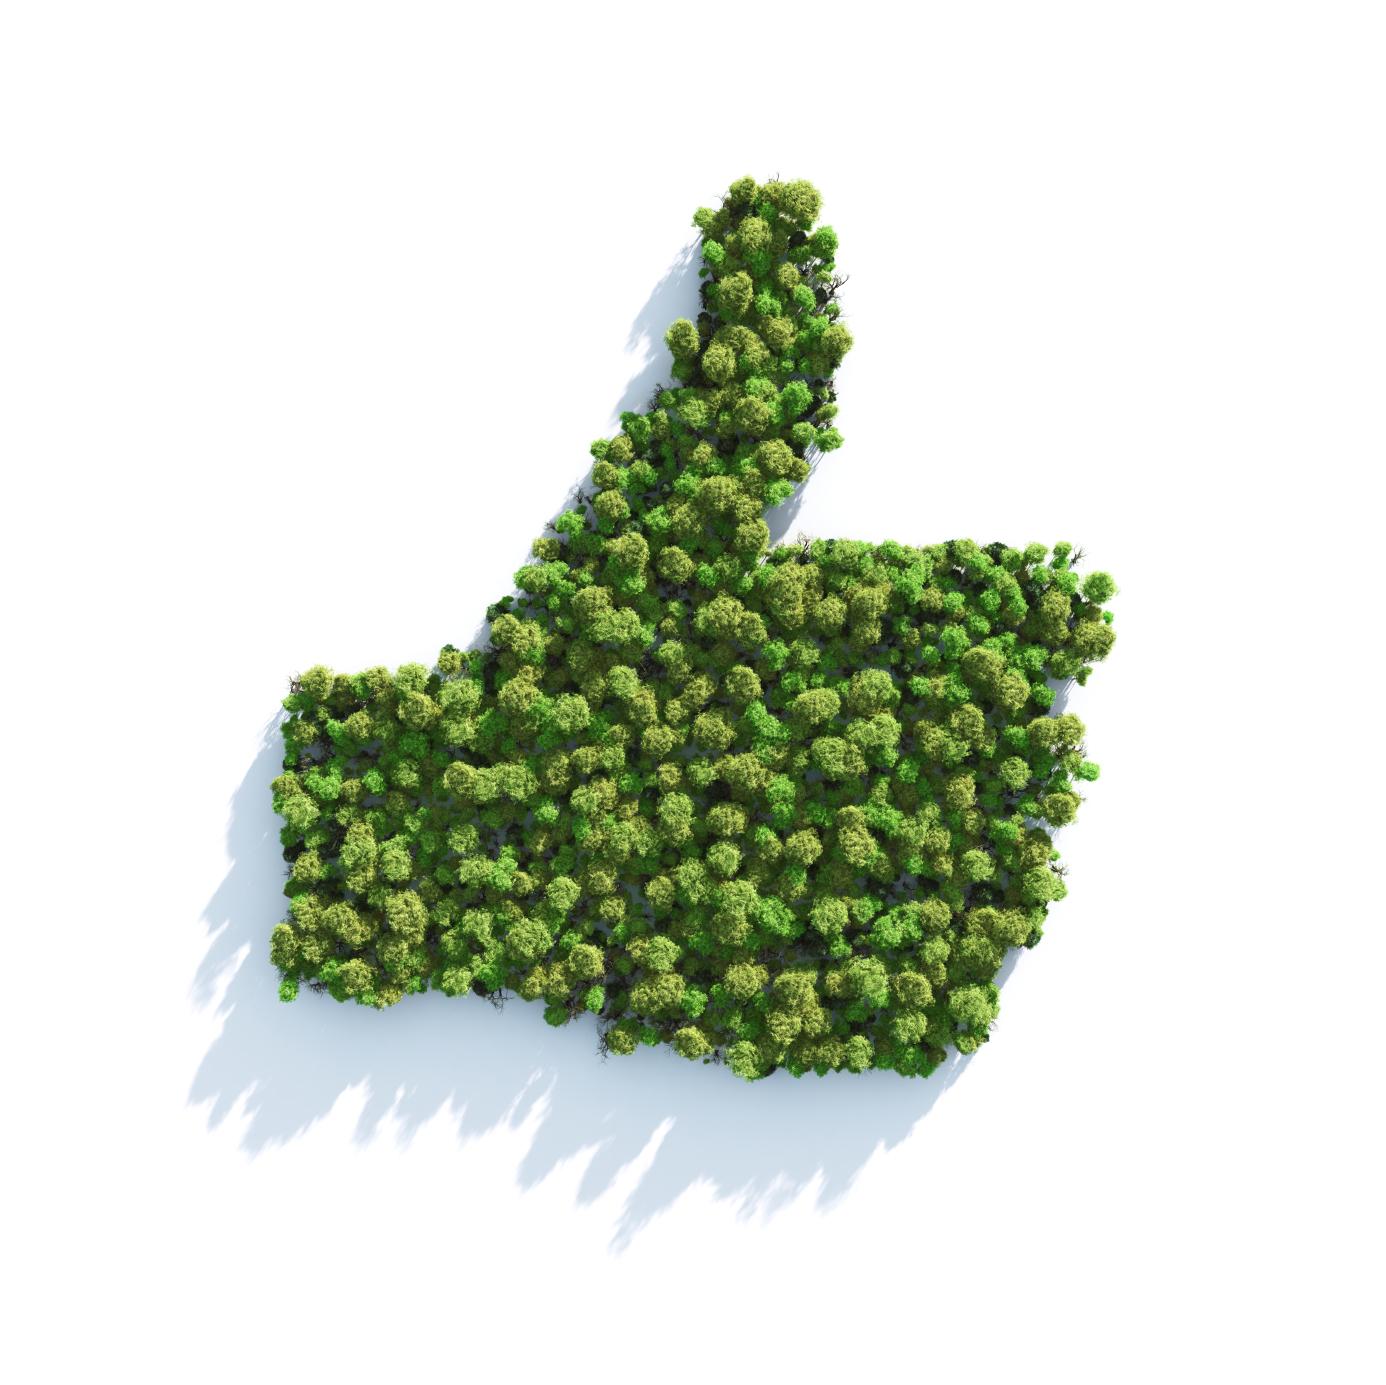 Iniciativas que ajudam a transformar o meio ambiente for Progetti di edilizia eco friendly